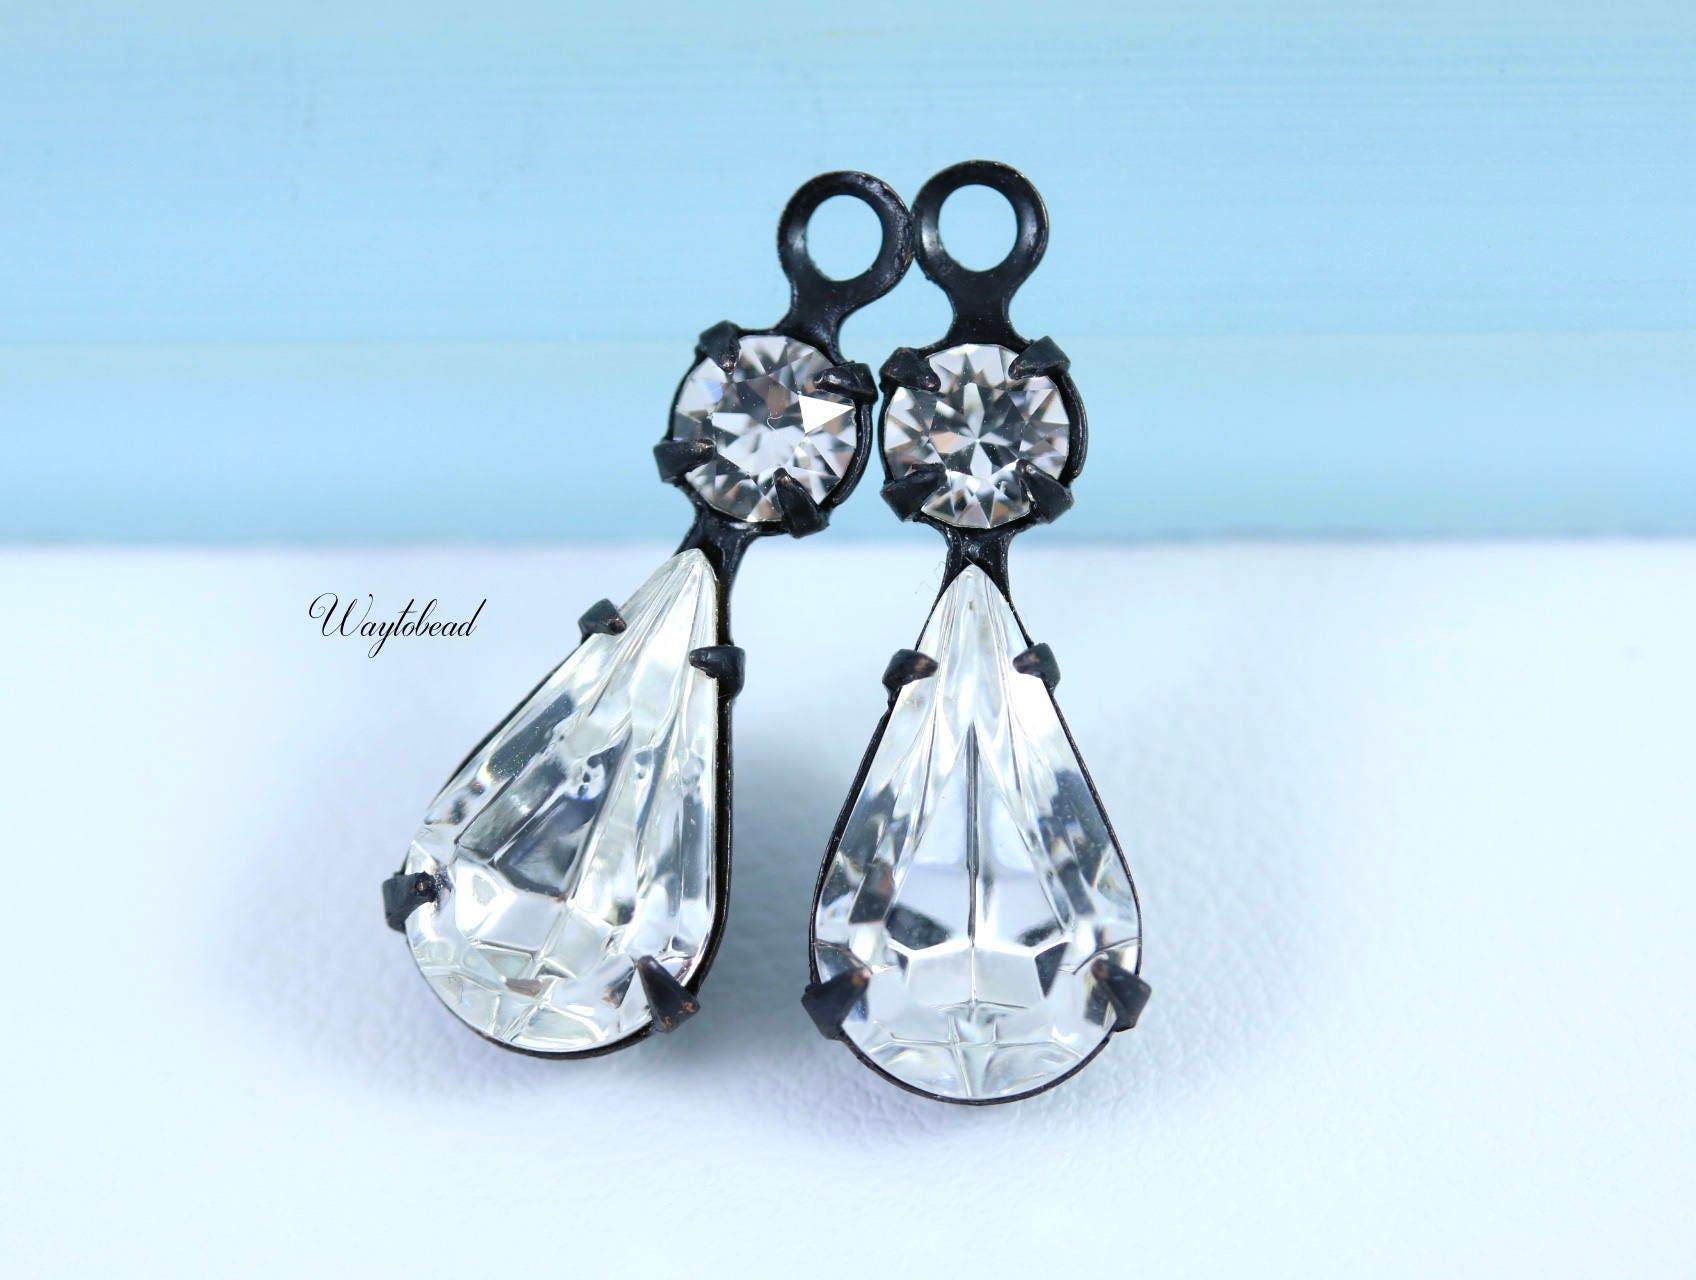 aecf6b0d653d Vintage Glass Drops Pear Shaped Set Stones 1 Ring Black